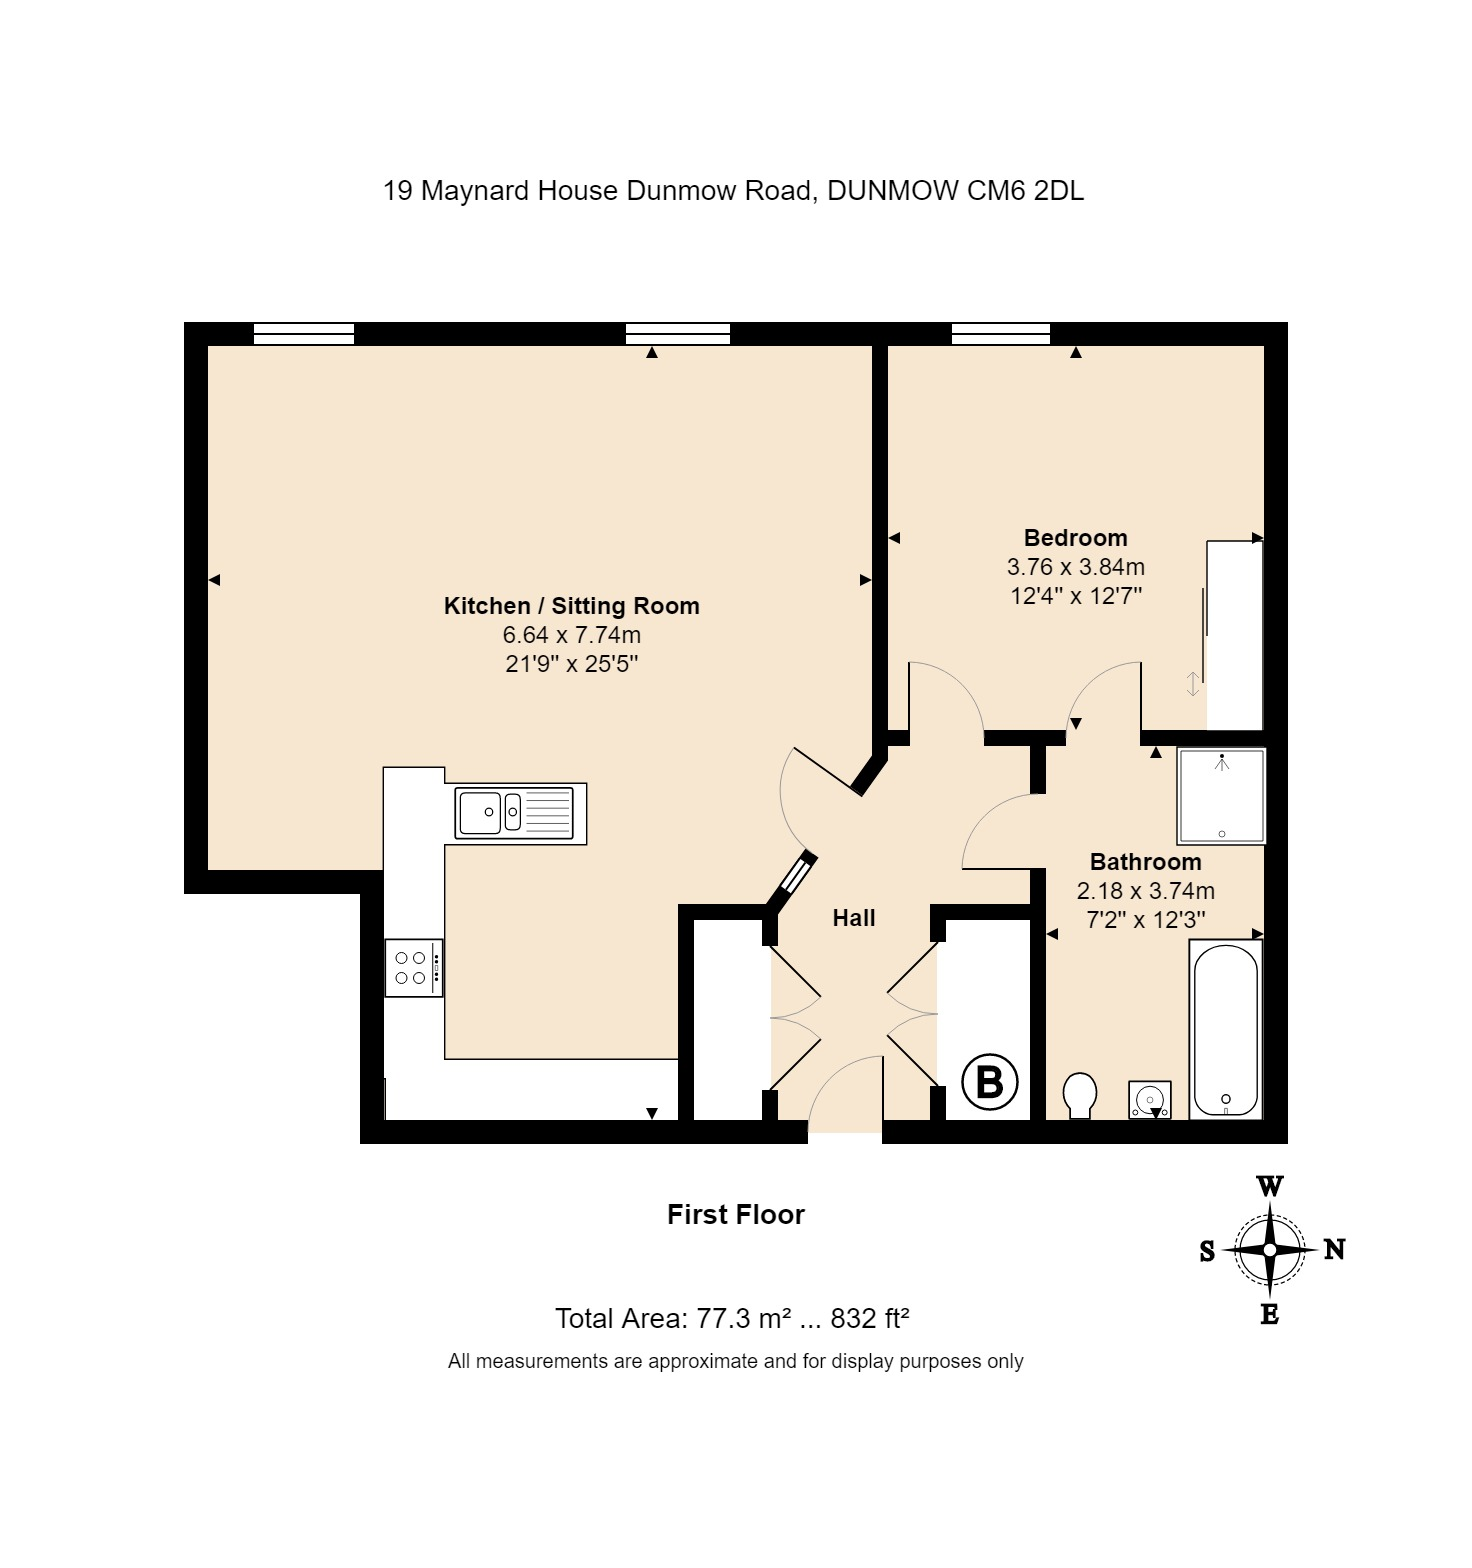 19 Maynard House Floorplan